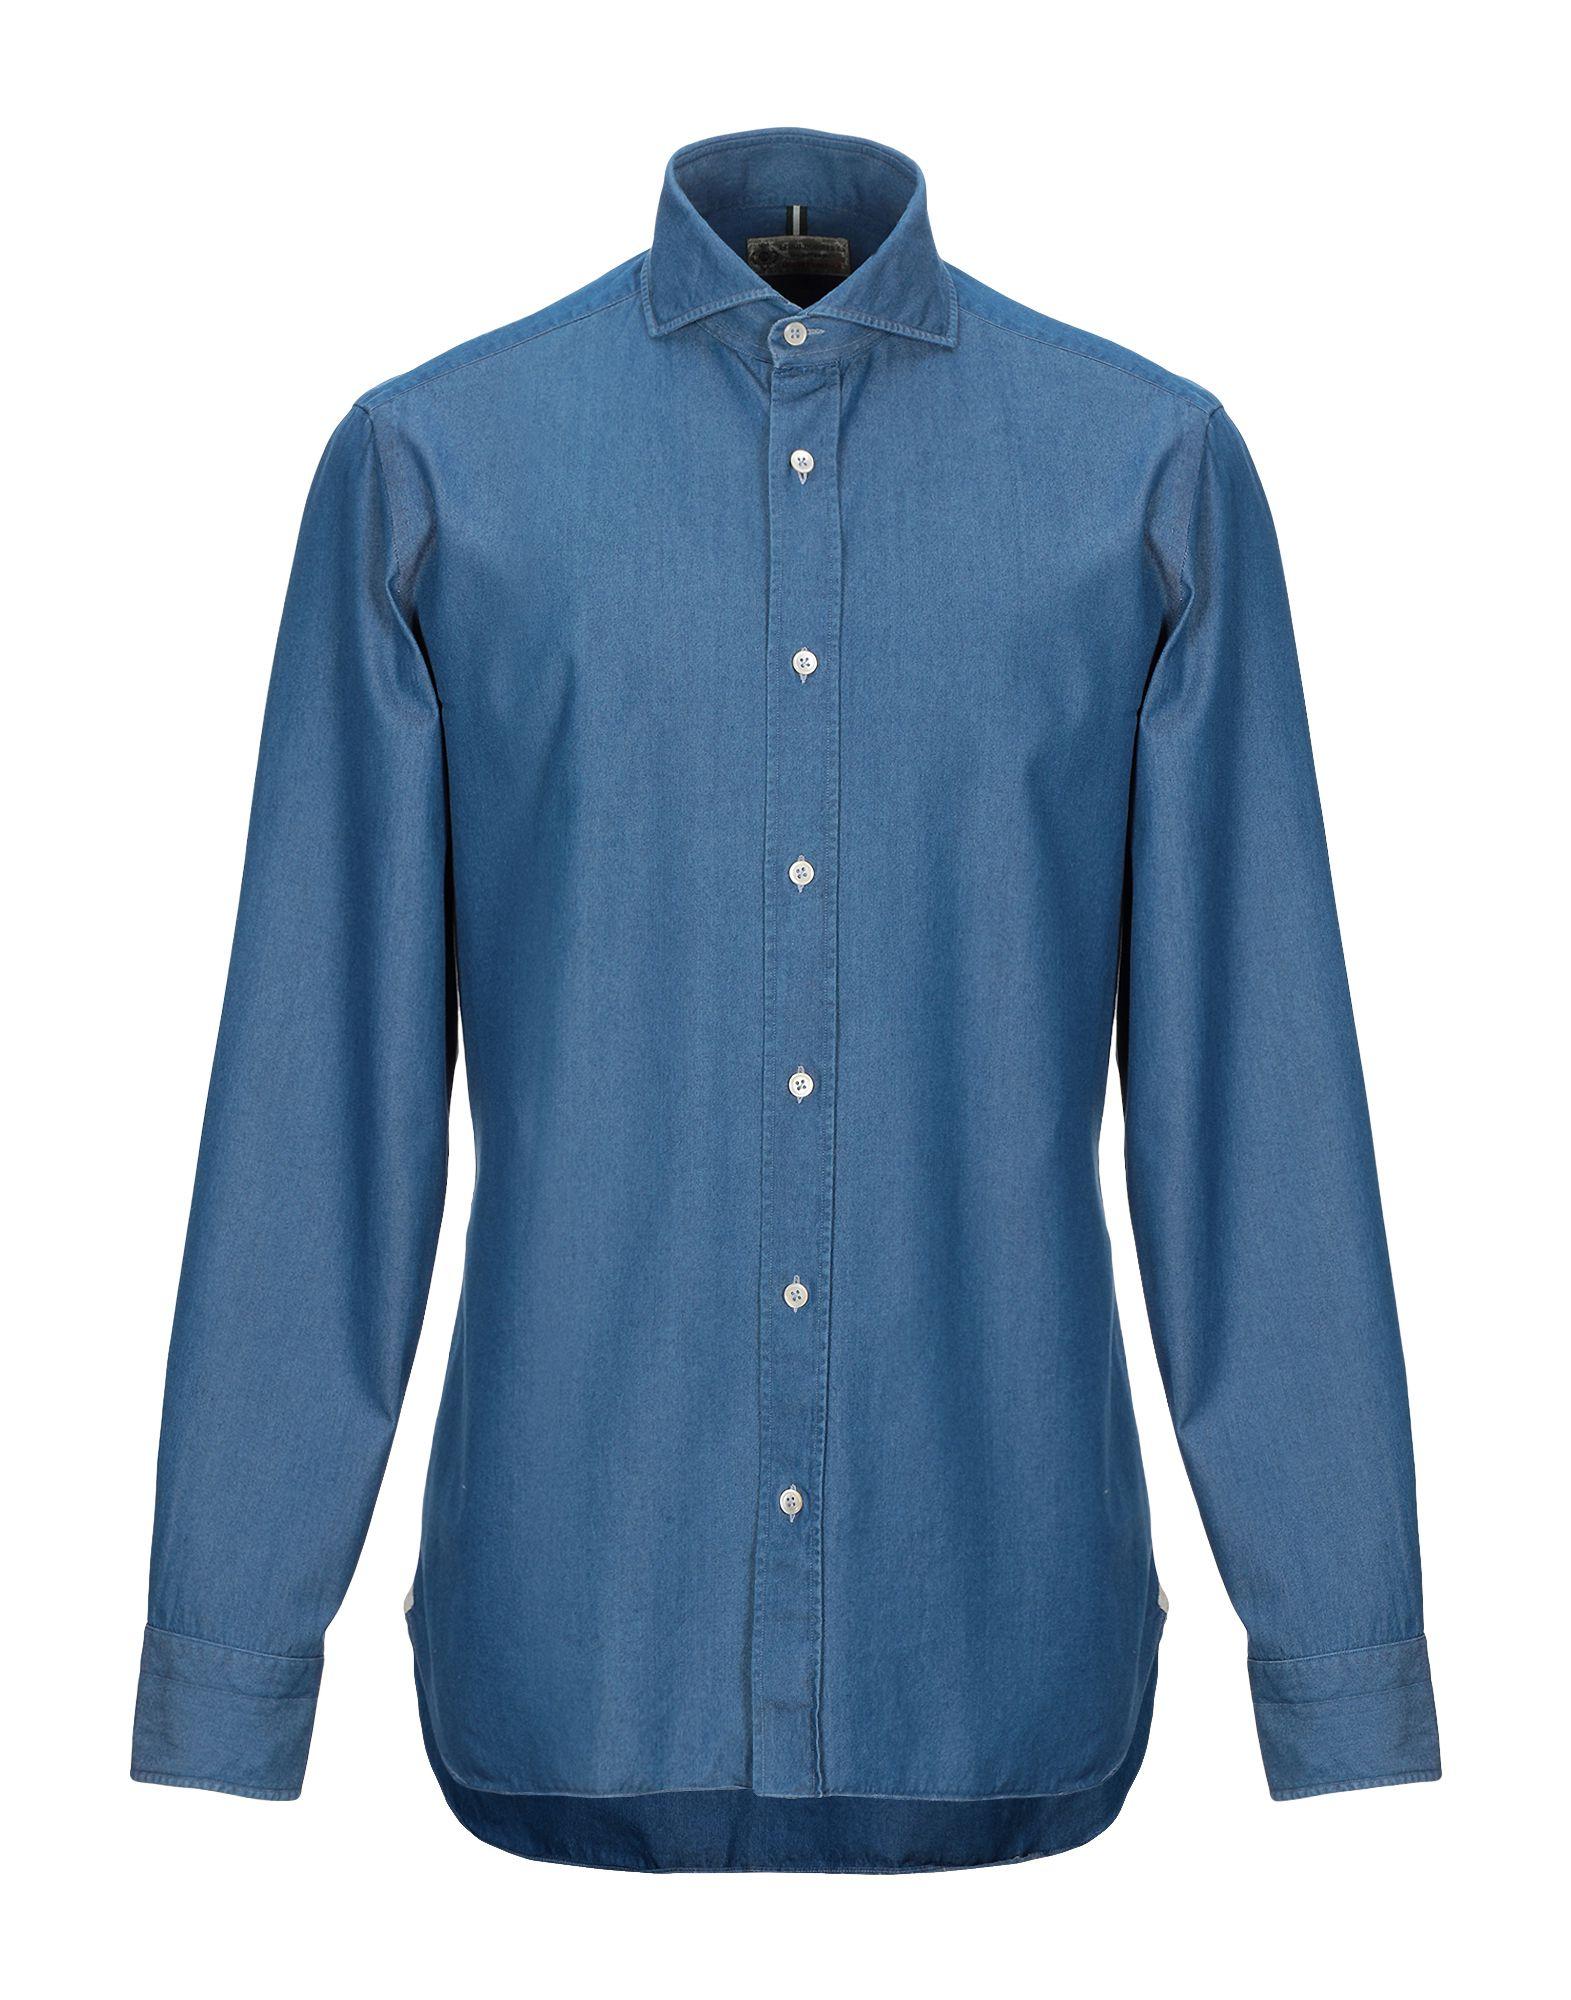 LUIGI BORRELLI NAPOLI Джинсовая рубашка luigi borrelli napoli джинсовая рубашка